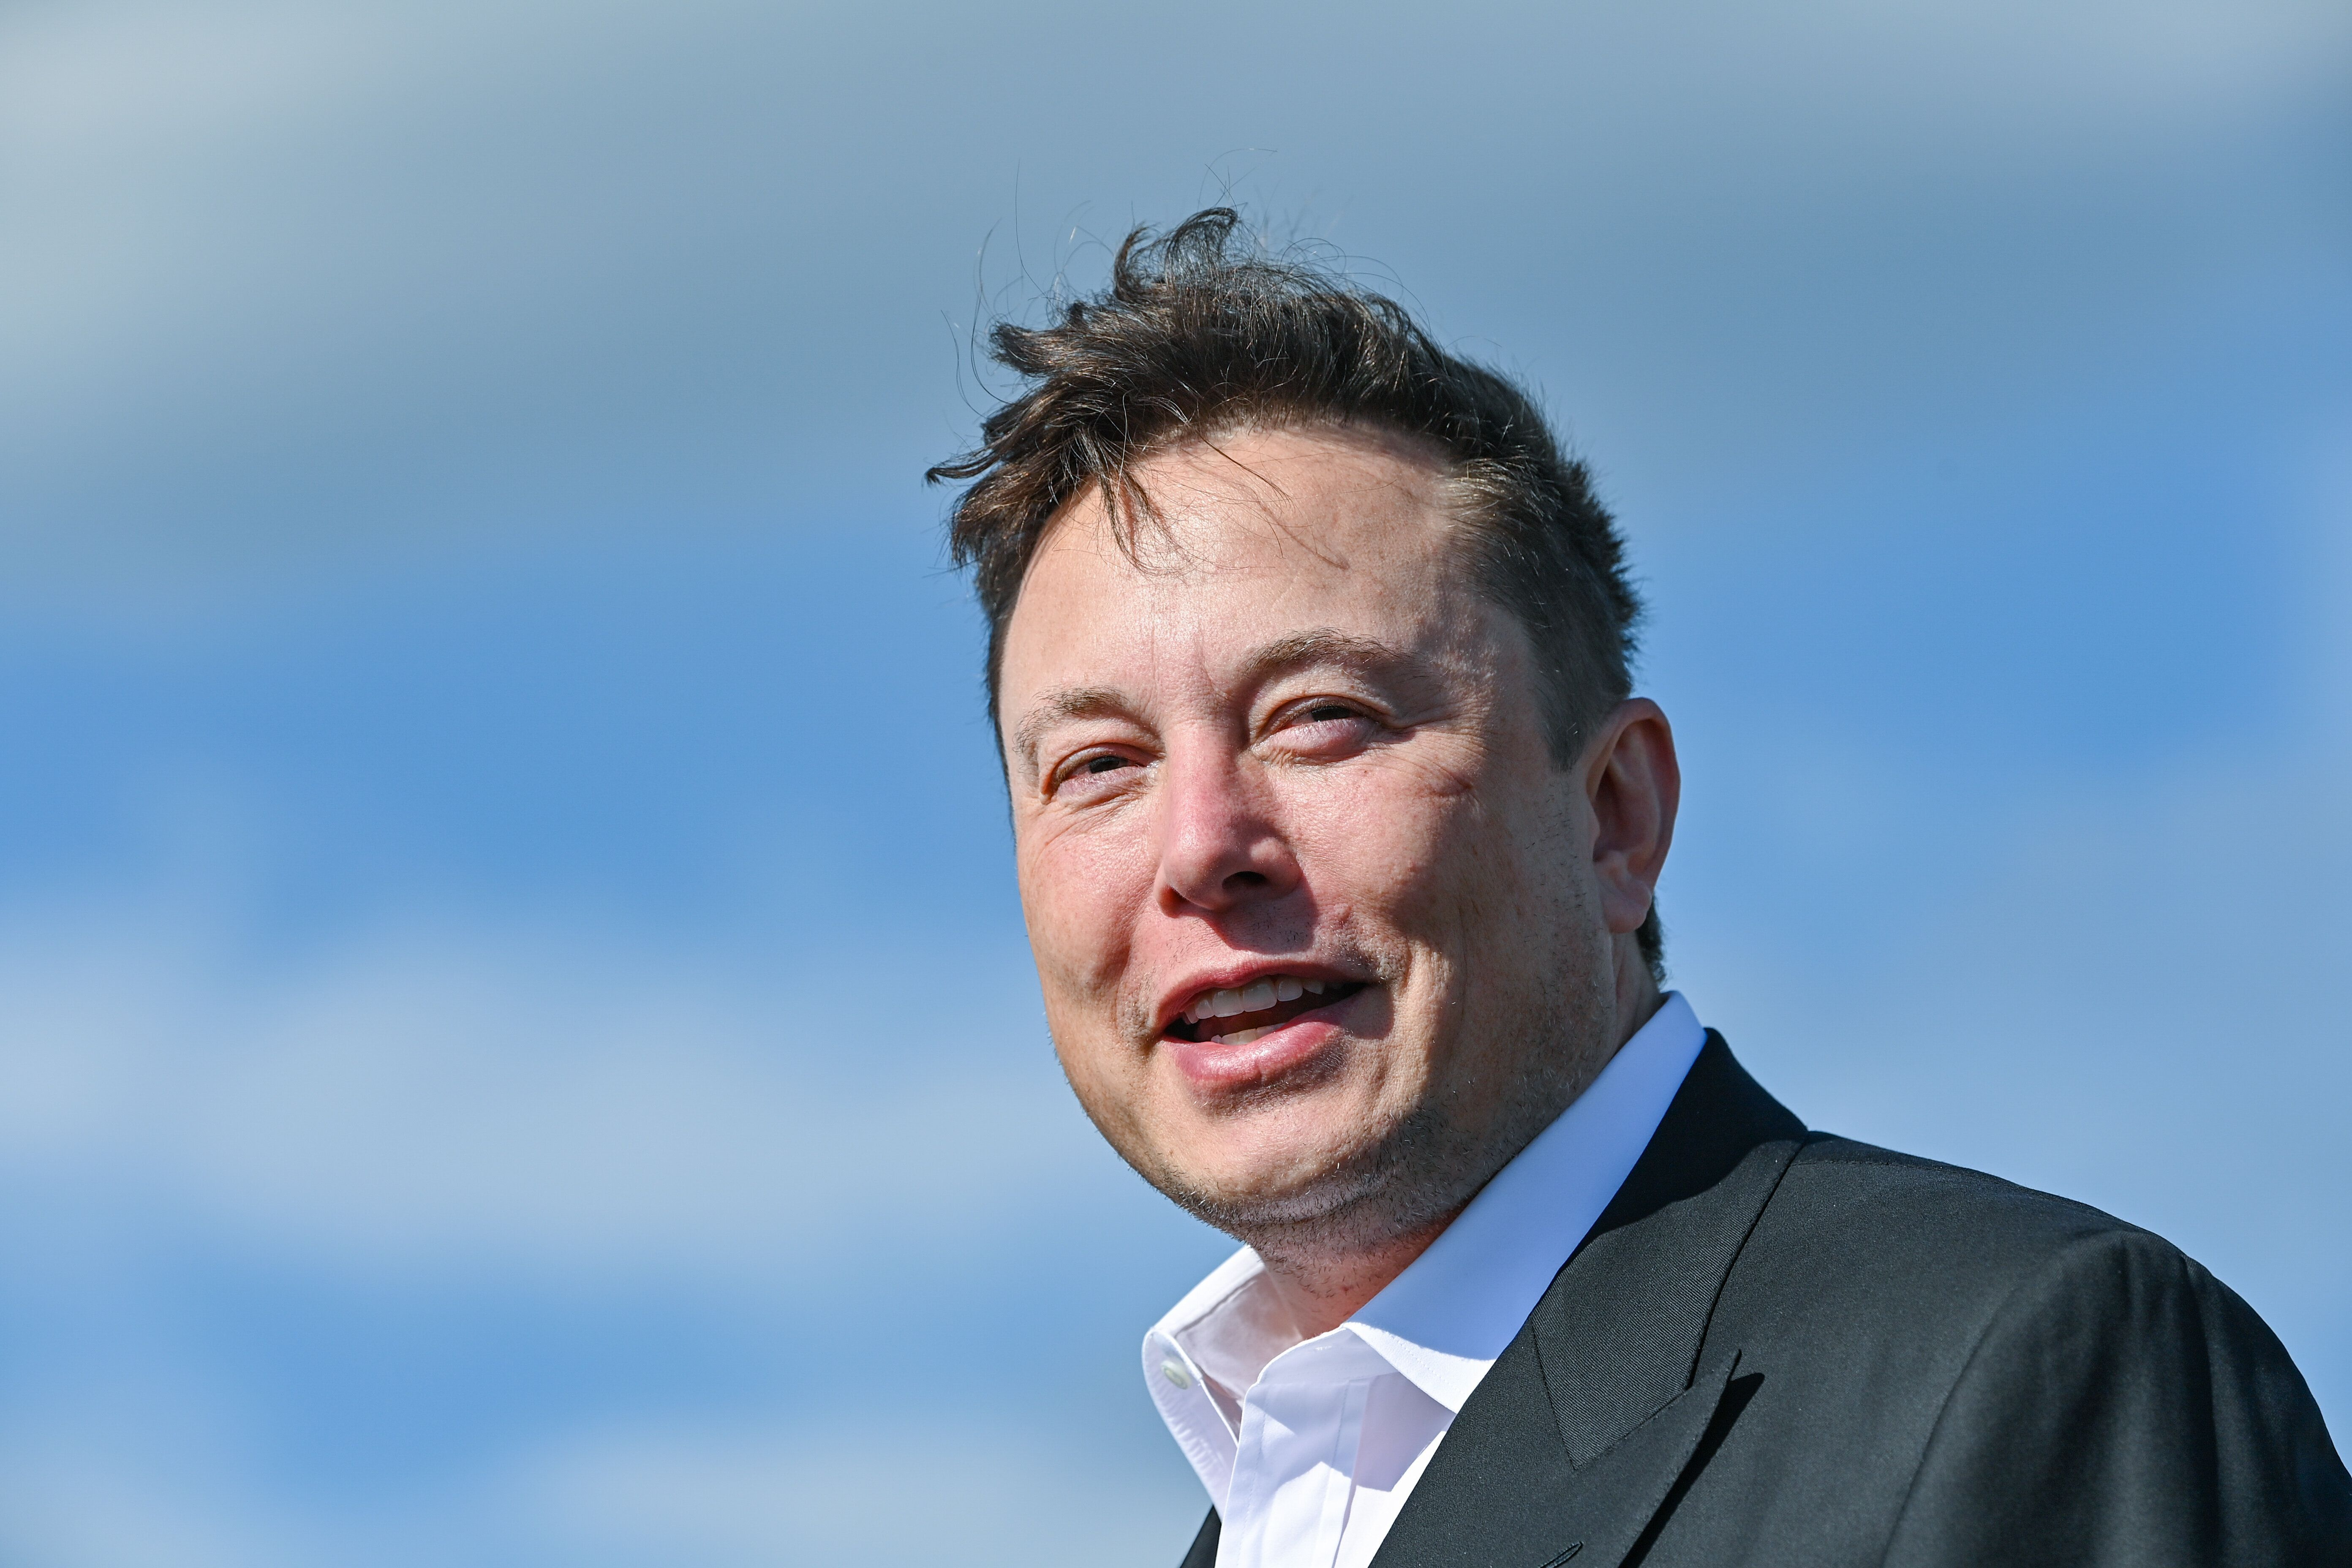 Elon Musk, head of Tesla. Photo: Patrick Pleul/dpa-Zentralbild/ZB (Photo by Patrick Pleul/picture alliance via Getty Images)